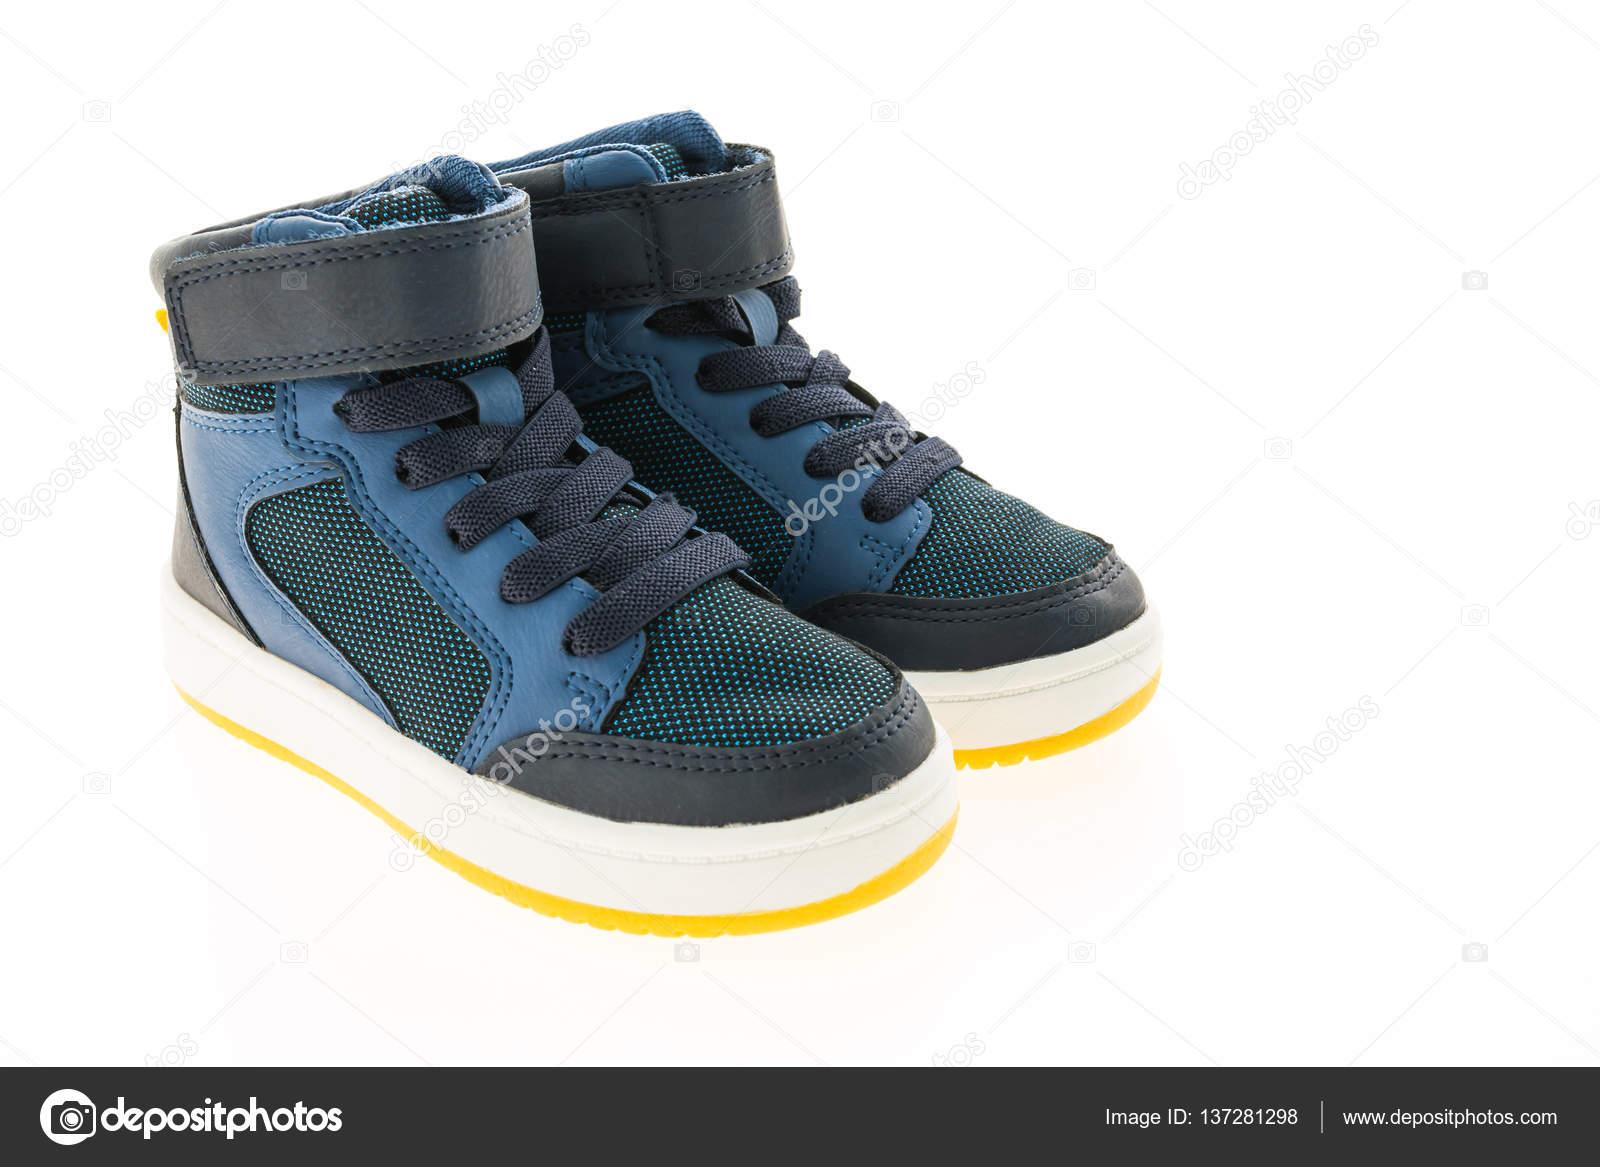 66d101f15f8 Μόδα παπούτσια και αθλητικά — Φωτογραφία Αρχείου © mrsiraphol #137281298